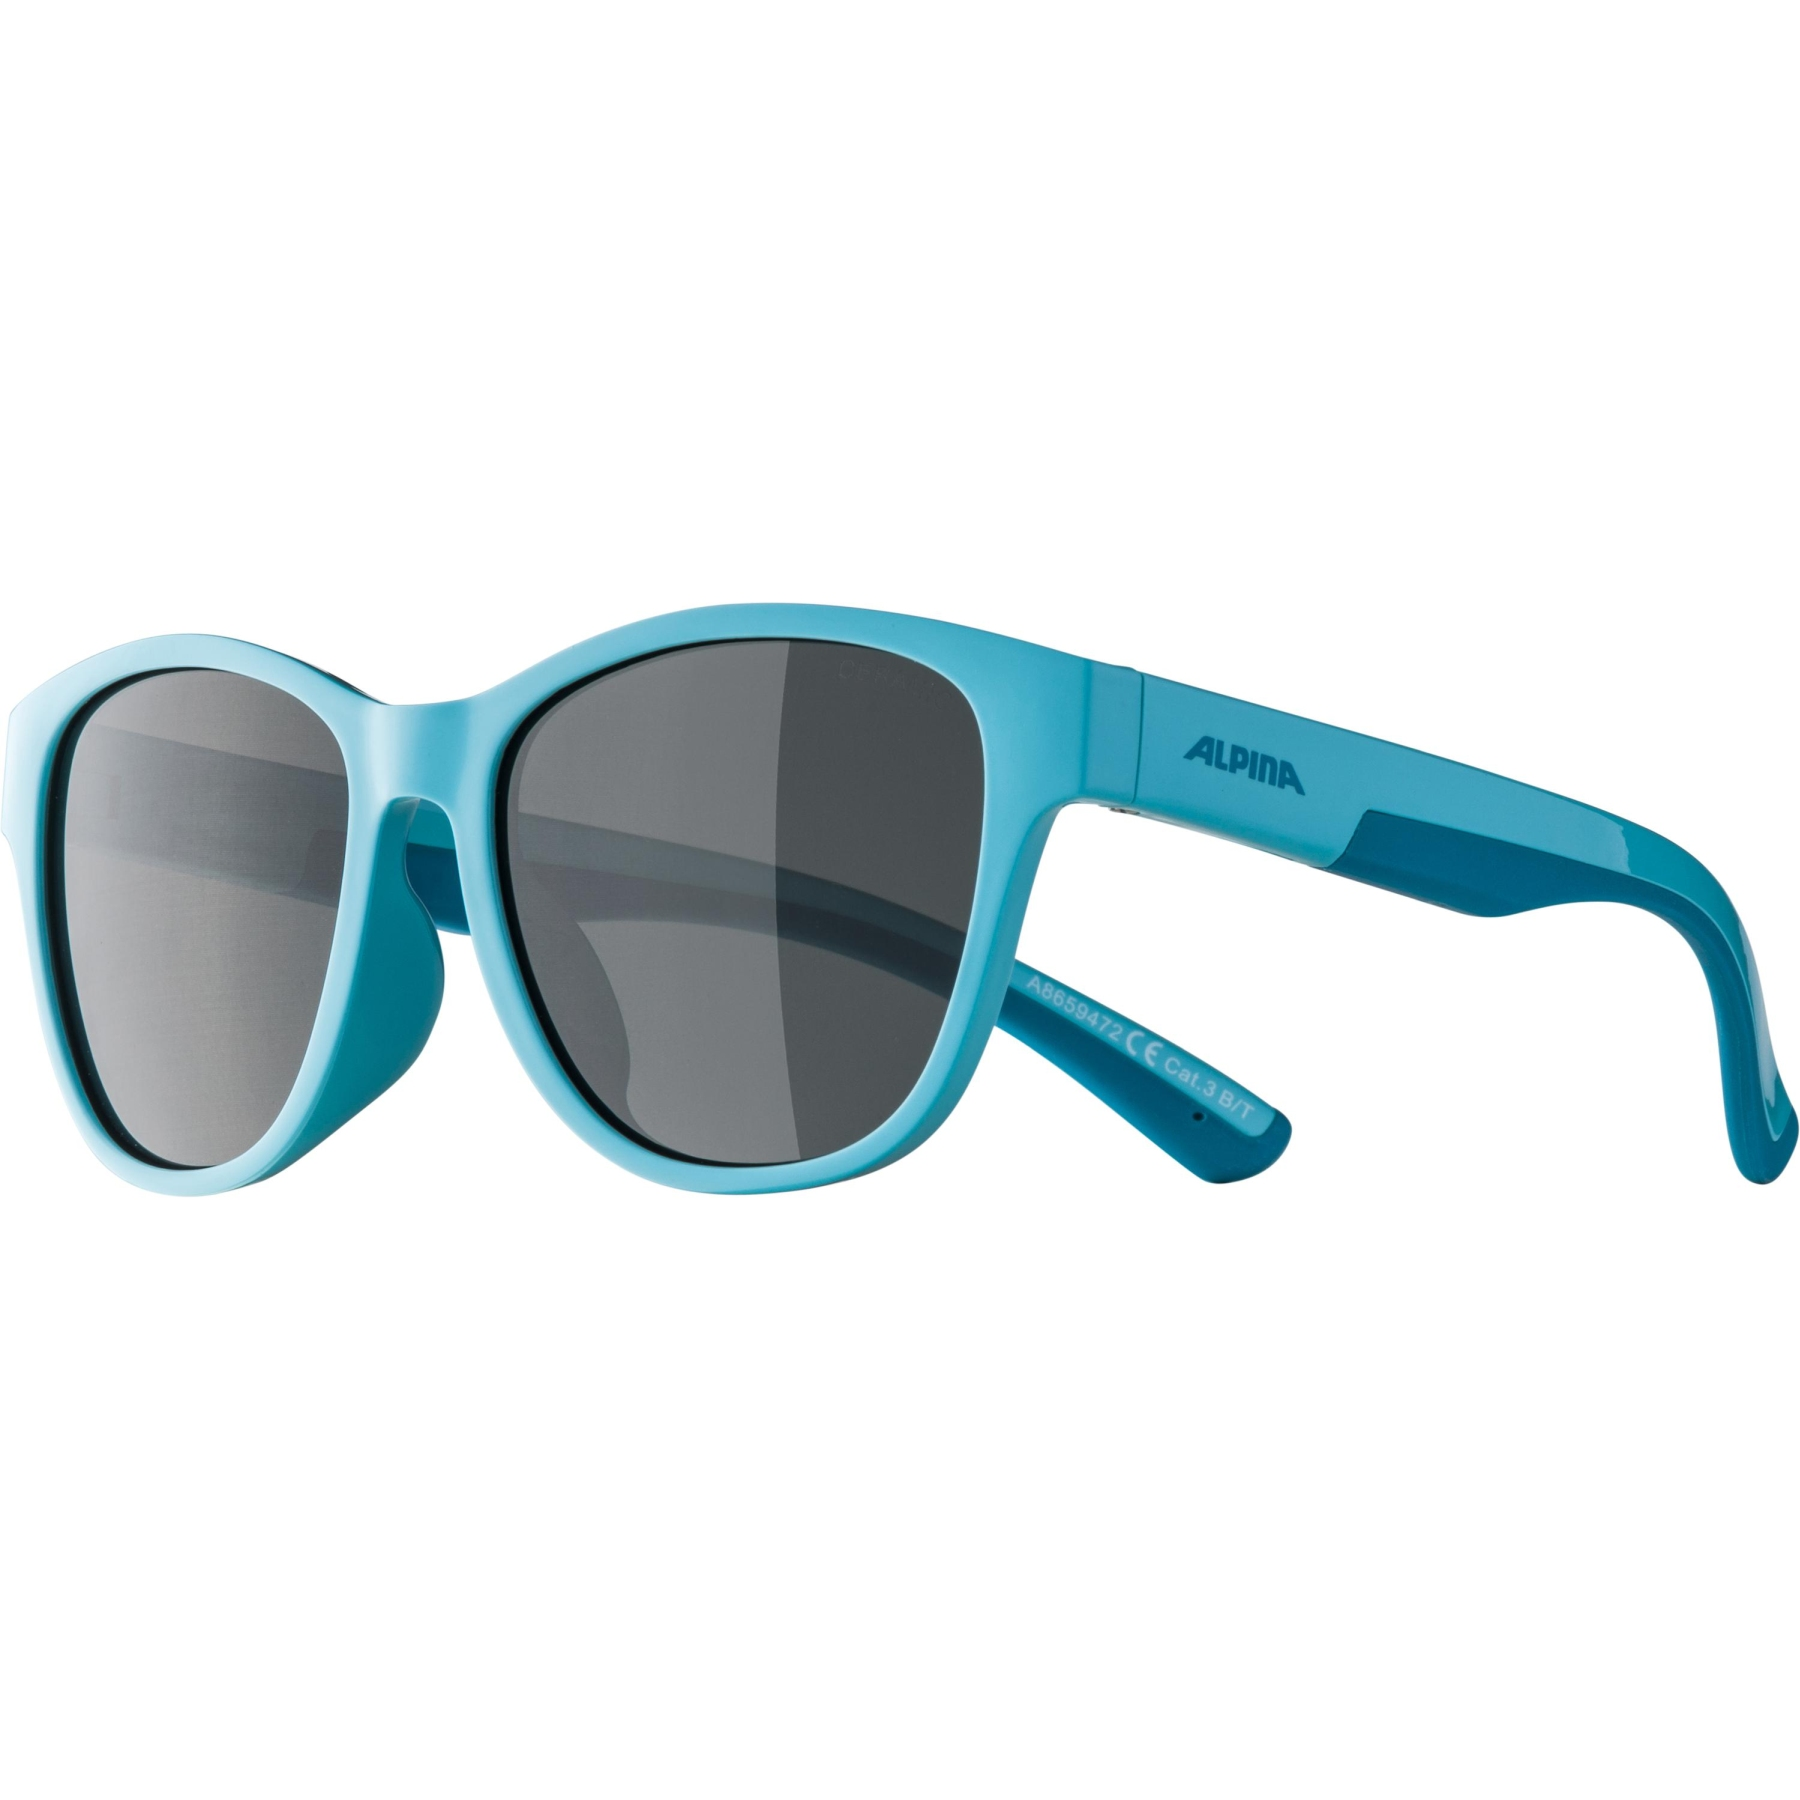 Image of Alpina Flexxy Cool Kids II Glasses - tourquise / black